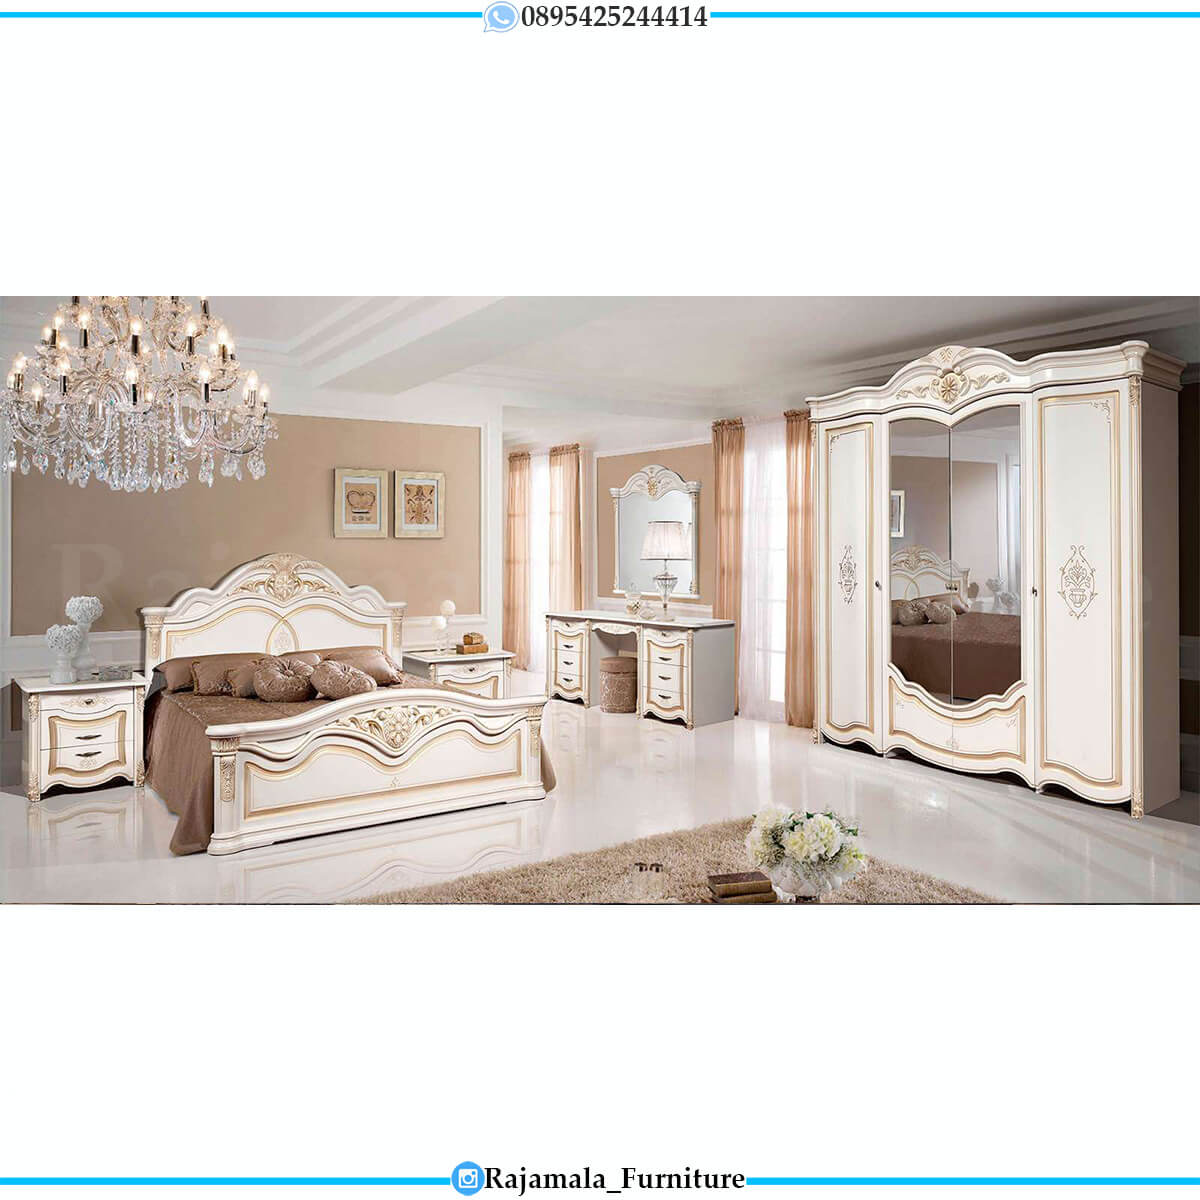 Tempat Tidur Mewah Jepara Luxury Carving Best Seller This Year RM-0697